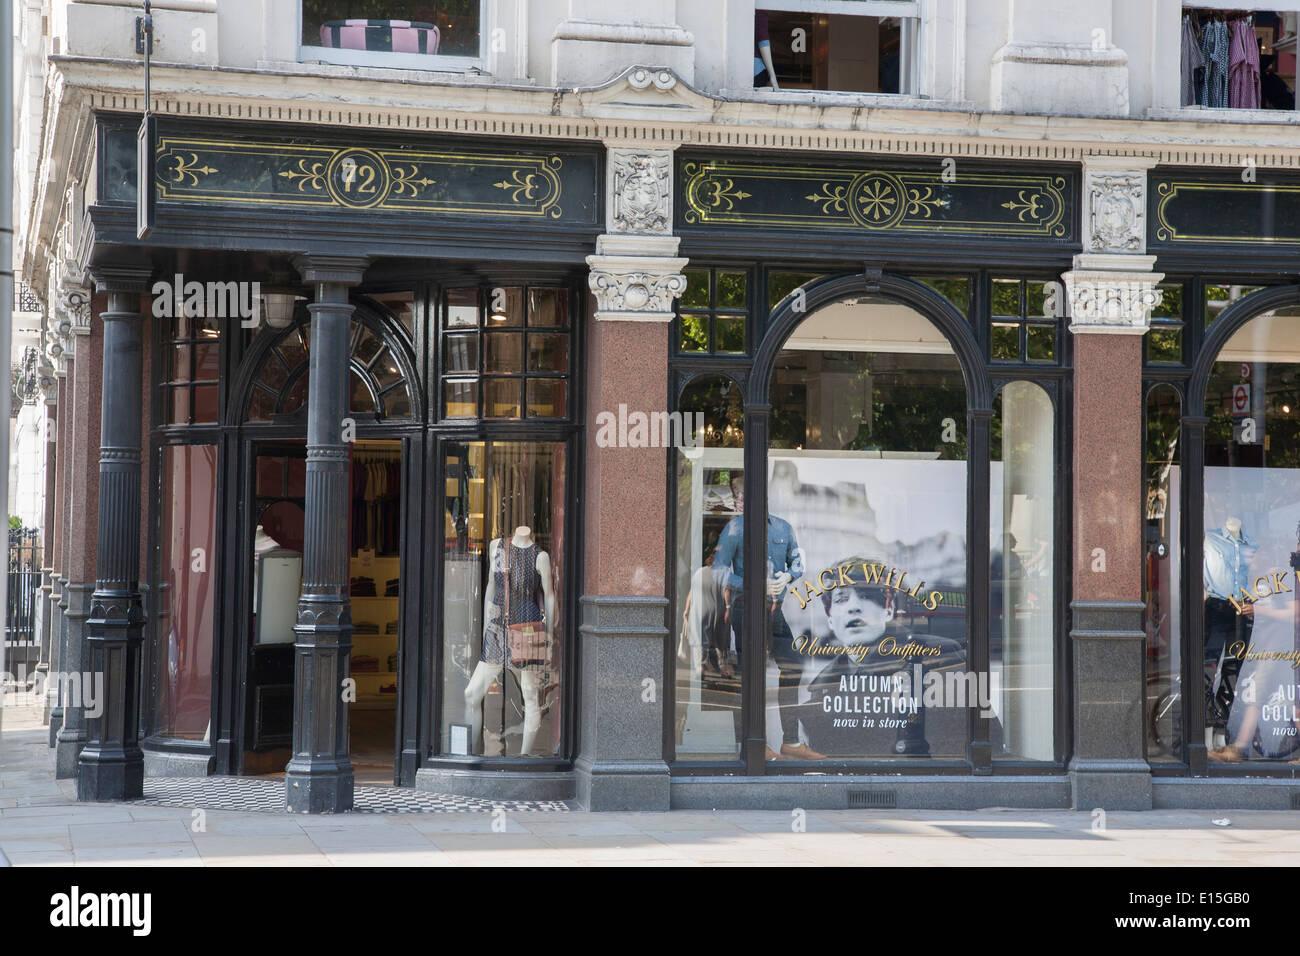 Jack Wills Shop; Kings Road; Chelsea; London; England; UK - Stock Image